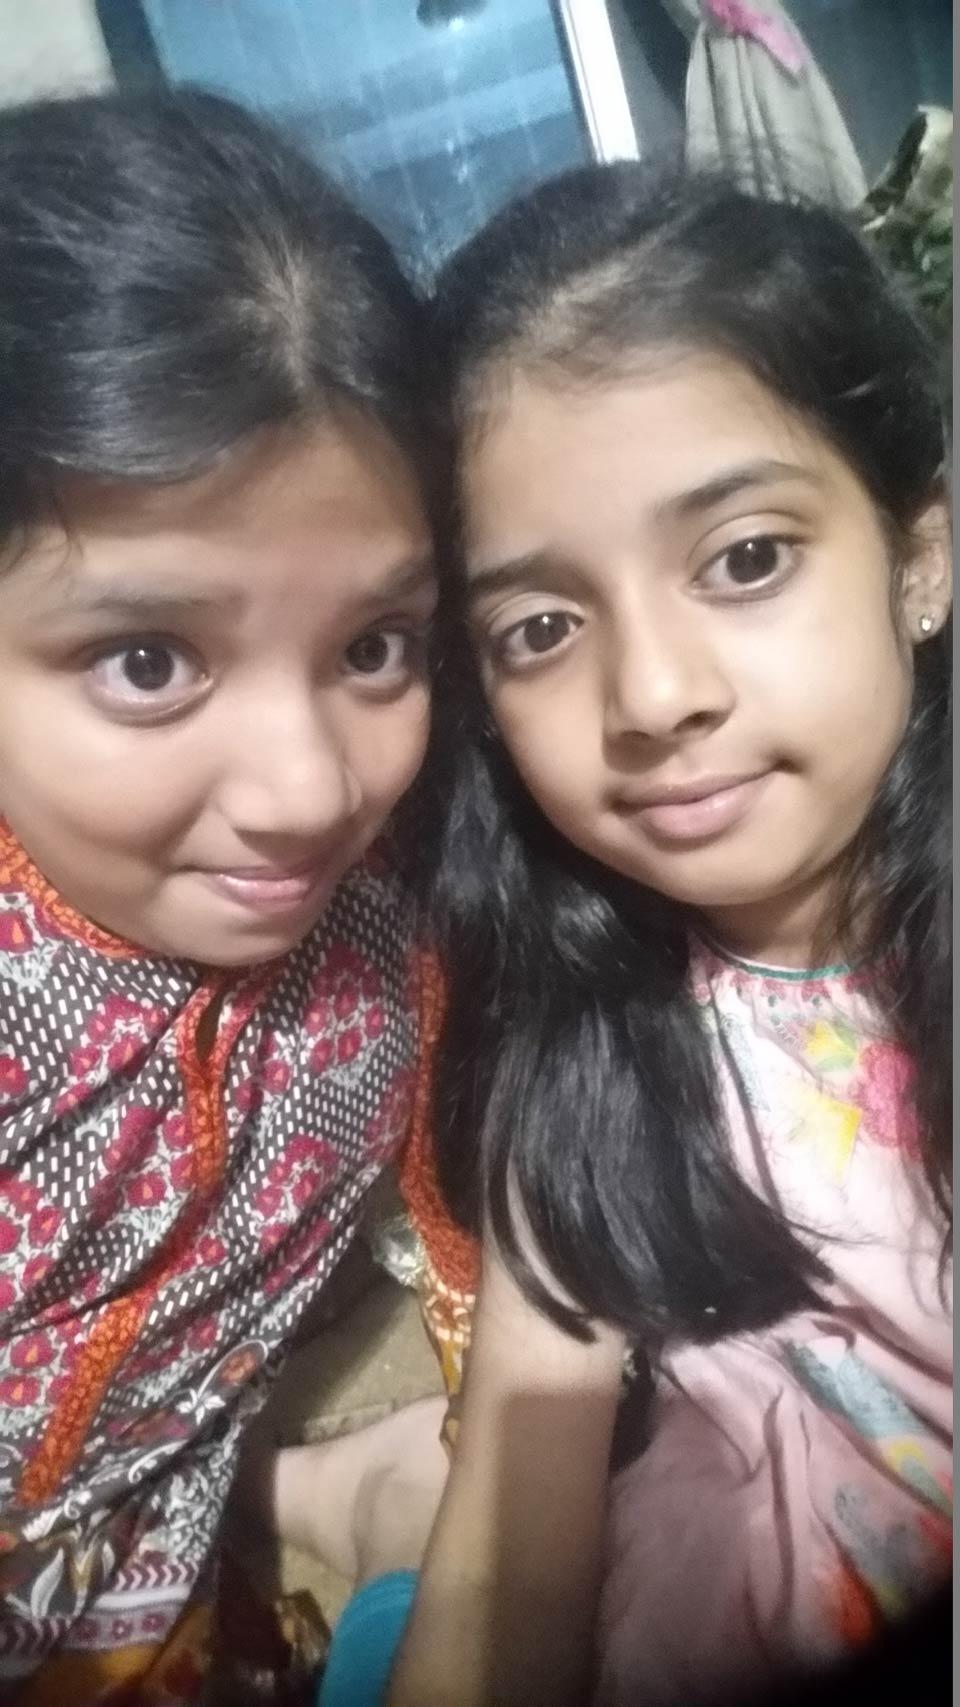 The two loving sisters Zoya Imran and Zara Imran